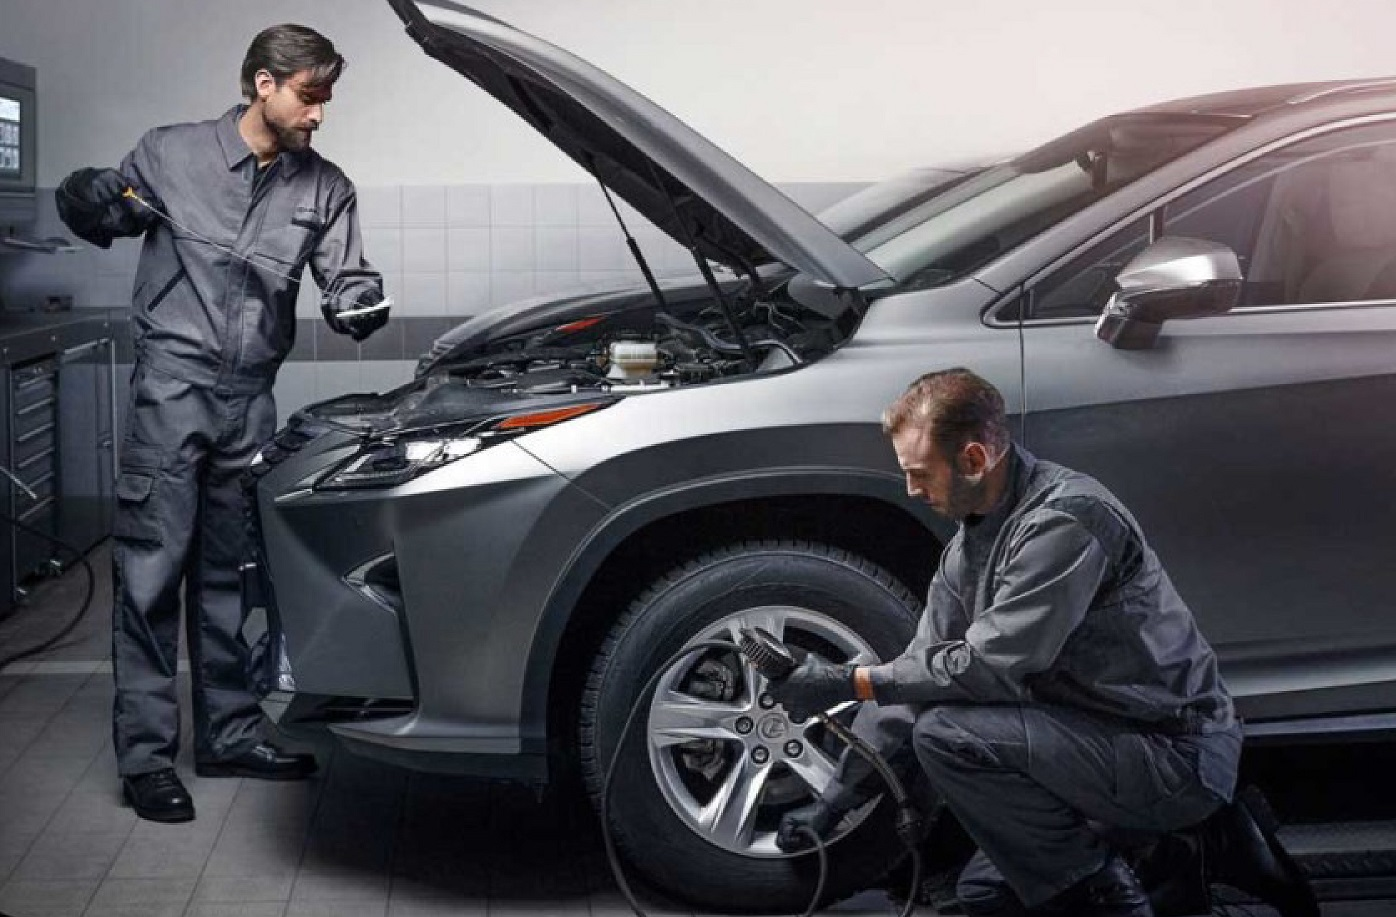 Car Services | خدمات السيارات